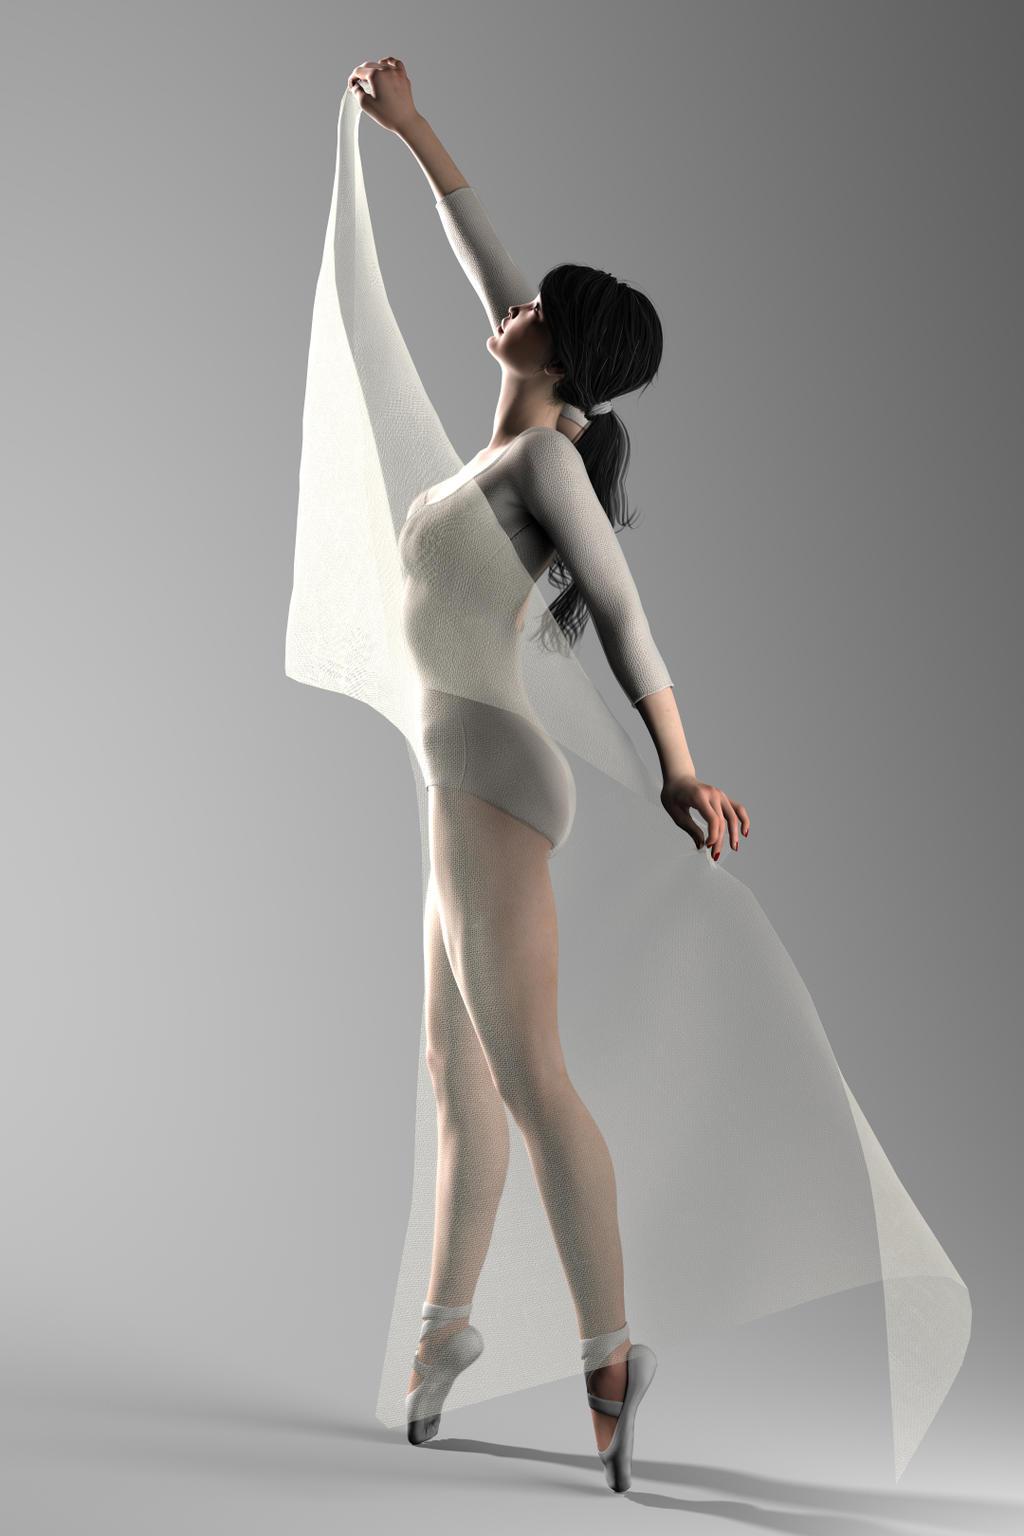 the dancer Part 2 by Digital3Dgrirls